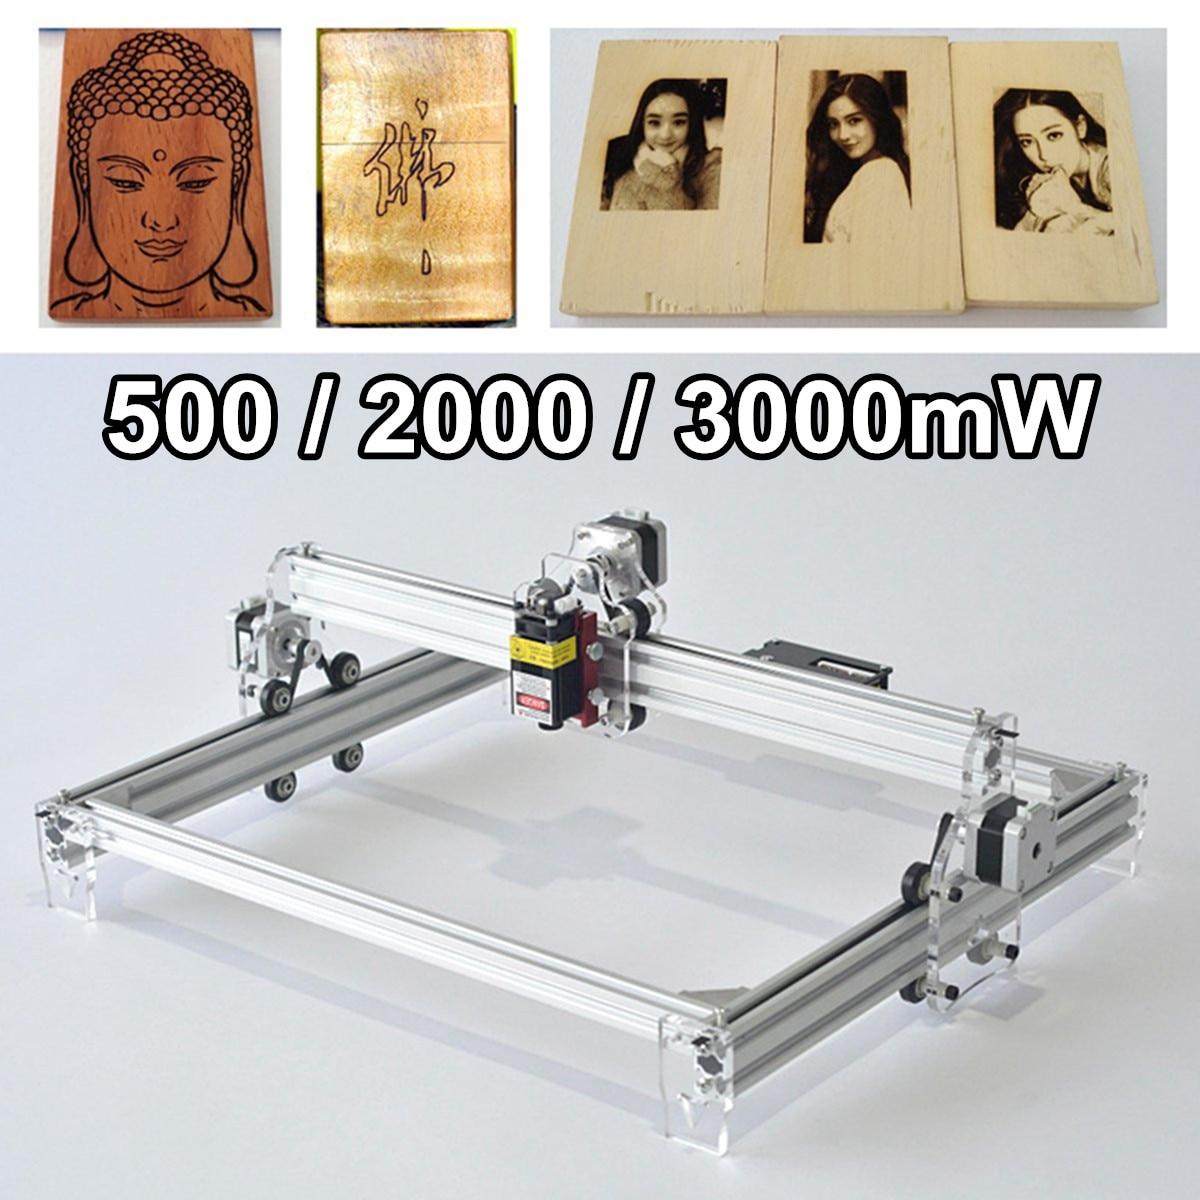 Mini 3000MW 2000mW 500mW Silver CNC Laser Engraving Machine 2Axis DC 12V DIY Engraver Desktop Wood Router/Cutter/PrinterMini 3000MW 2000mW 500mW Silver CNC Laser Engraving Machine 2Axis DC 12V DIY Engraver Desktop Wood Router/Cutter/Printer